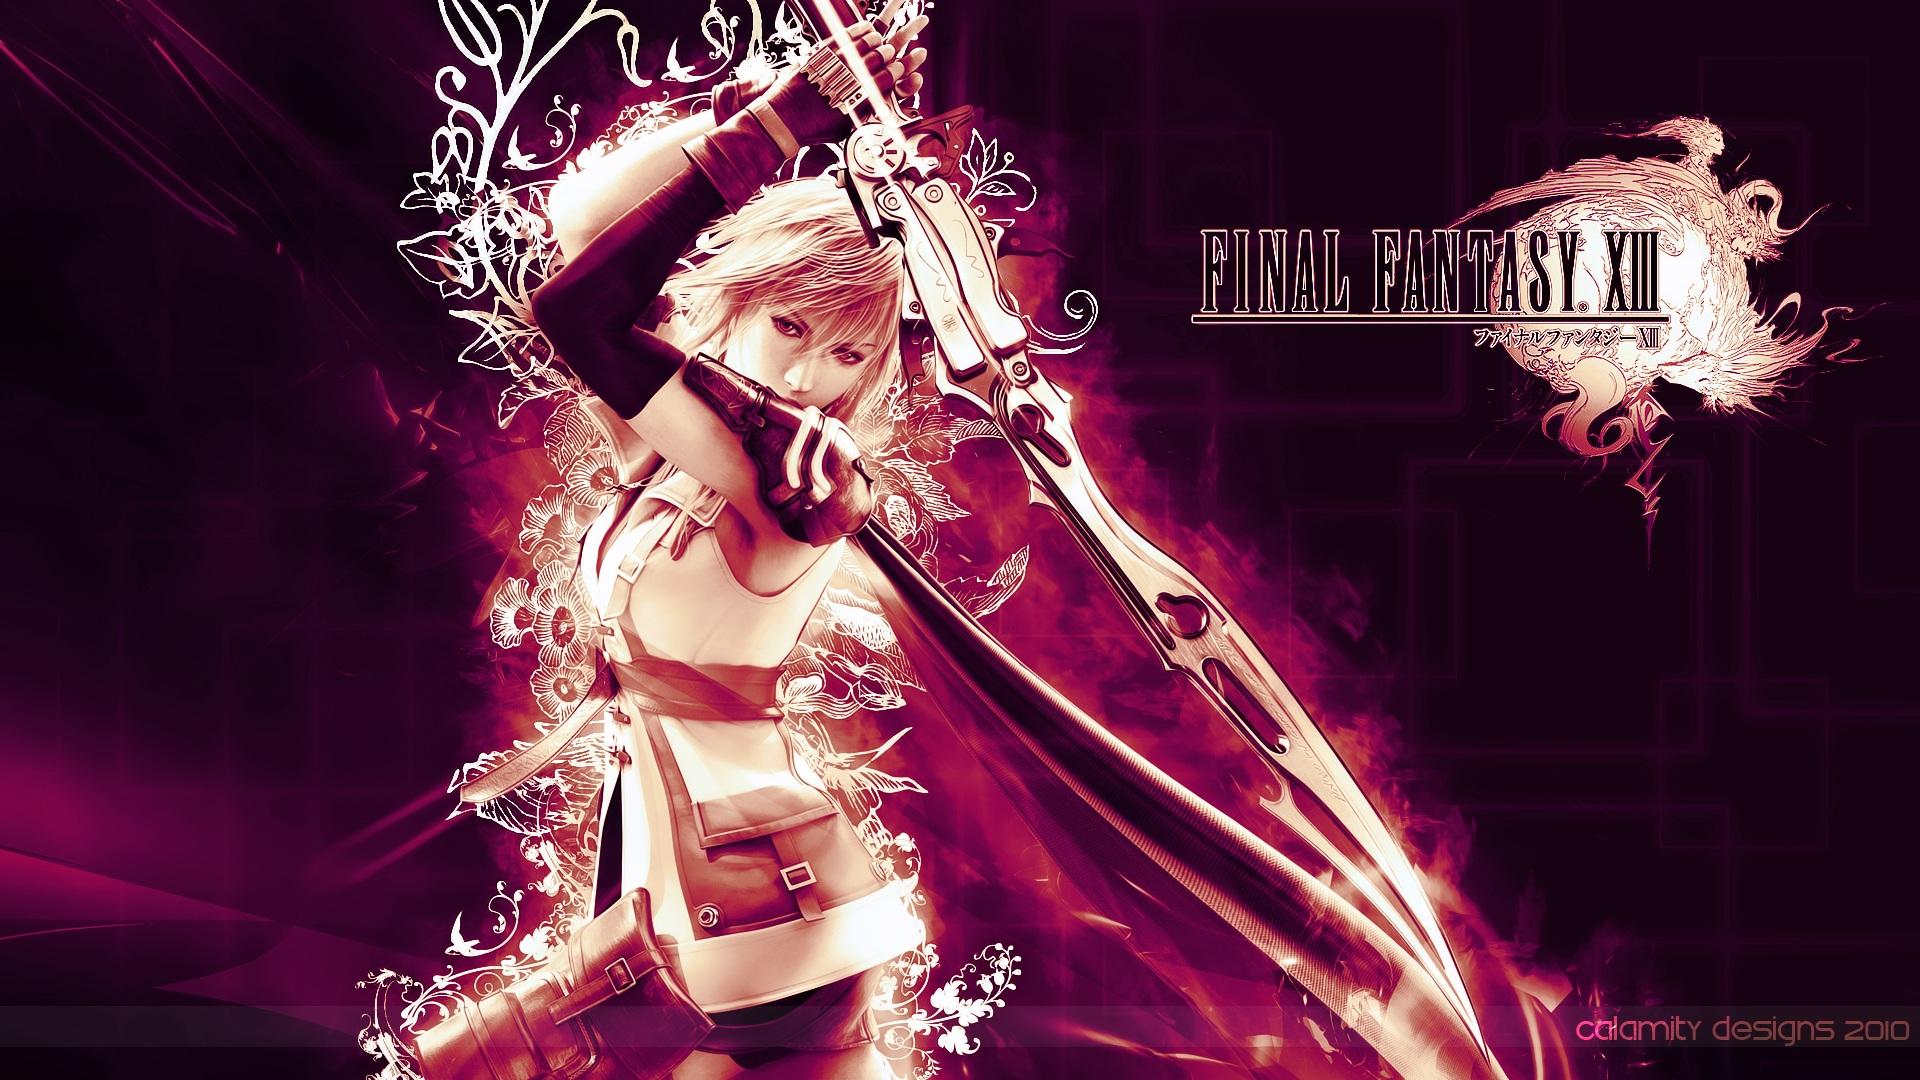 Free Download Download Lightning Final Fantasy Xiii Wallnen